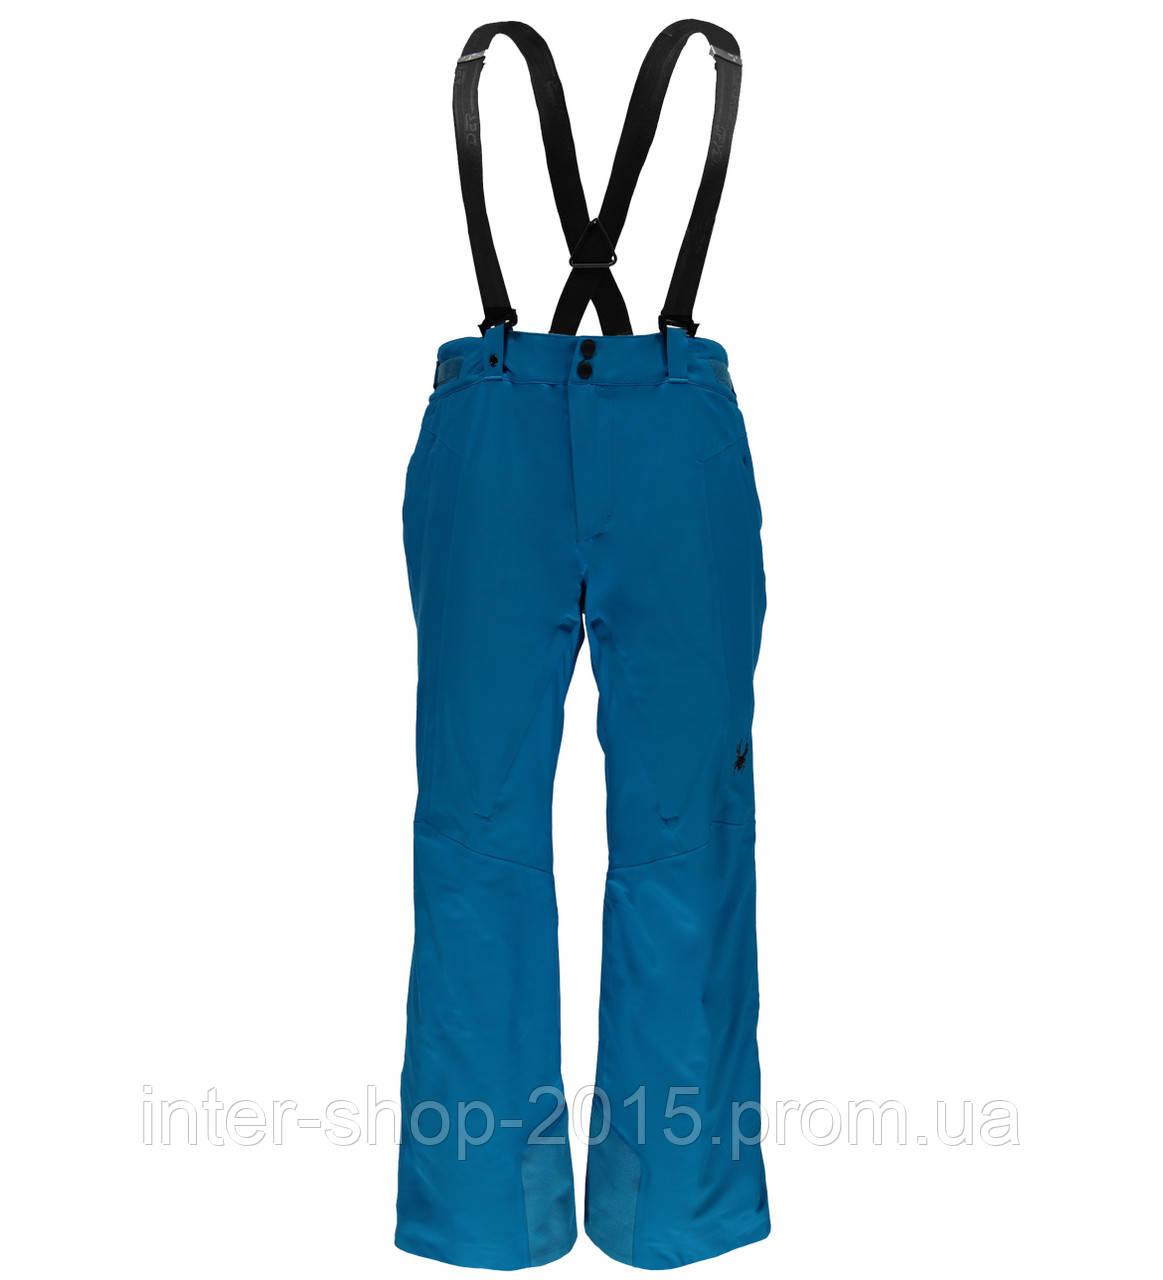 Мужские горнолыжные штаны Spyder BANFF Pant  Blue 783232